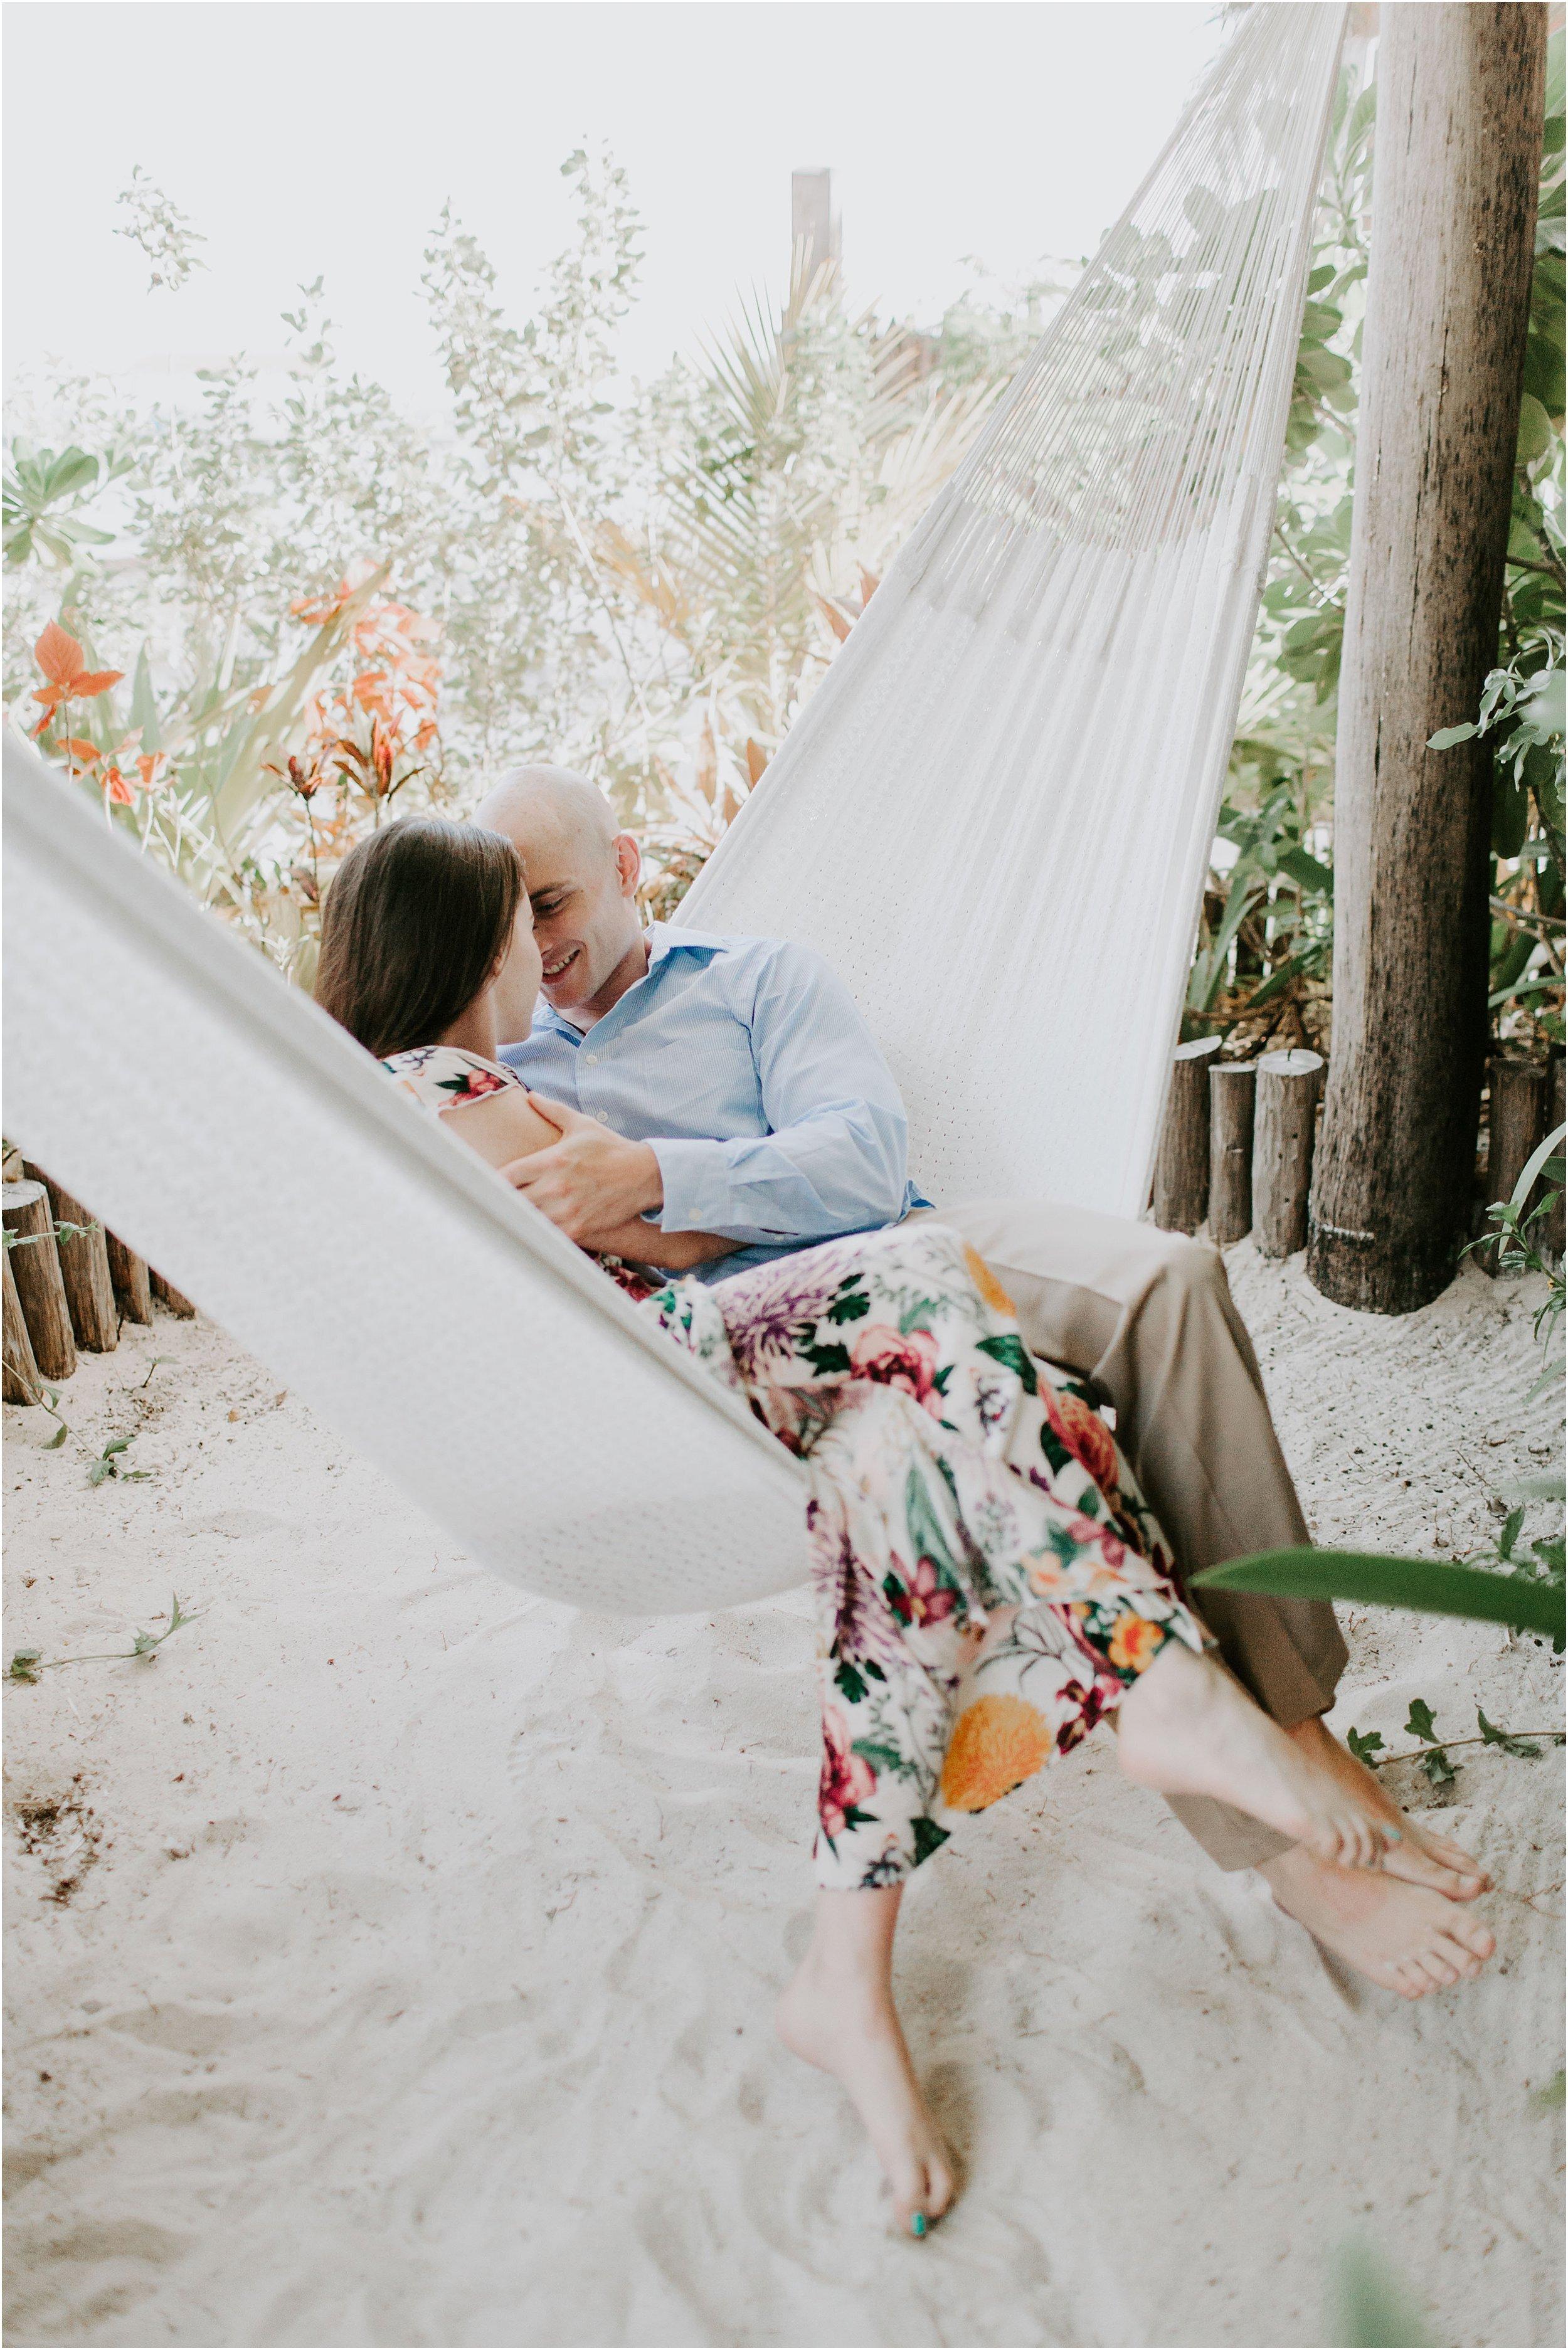 A couple snuggles in a hammock in Belize.